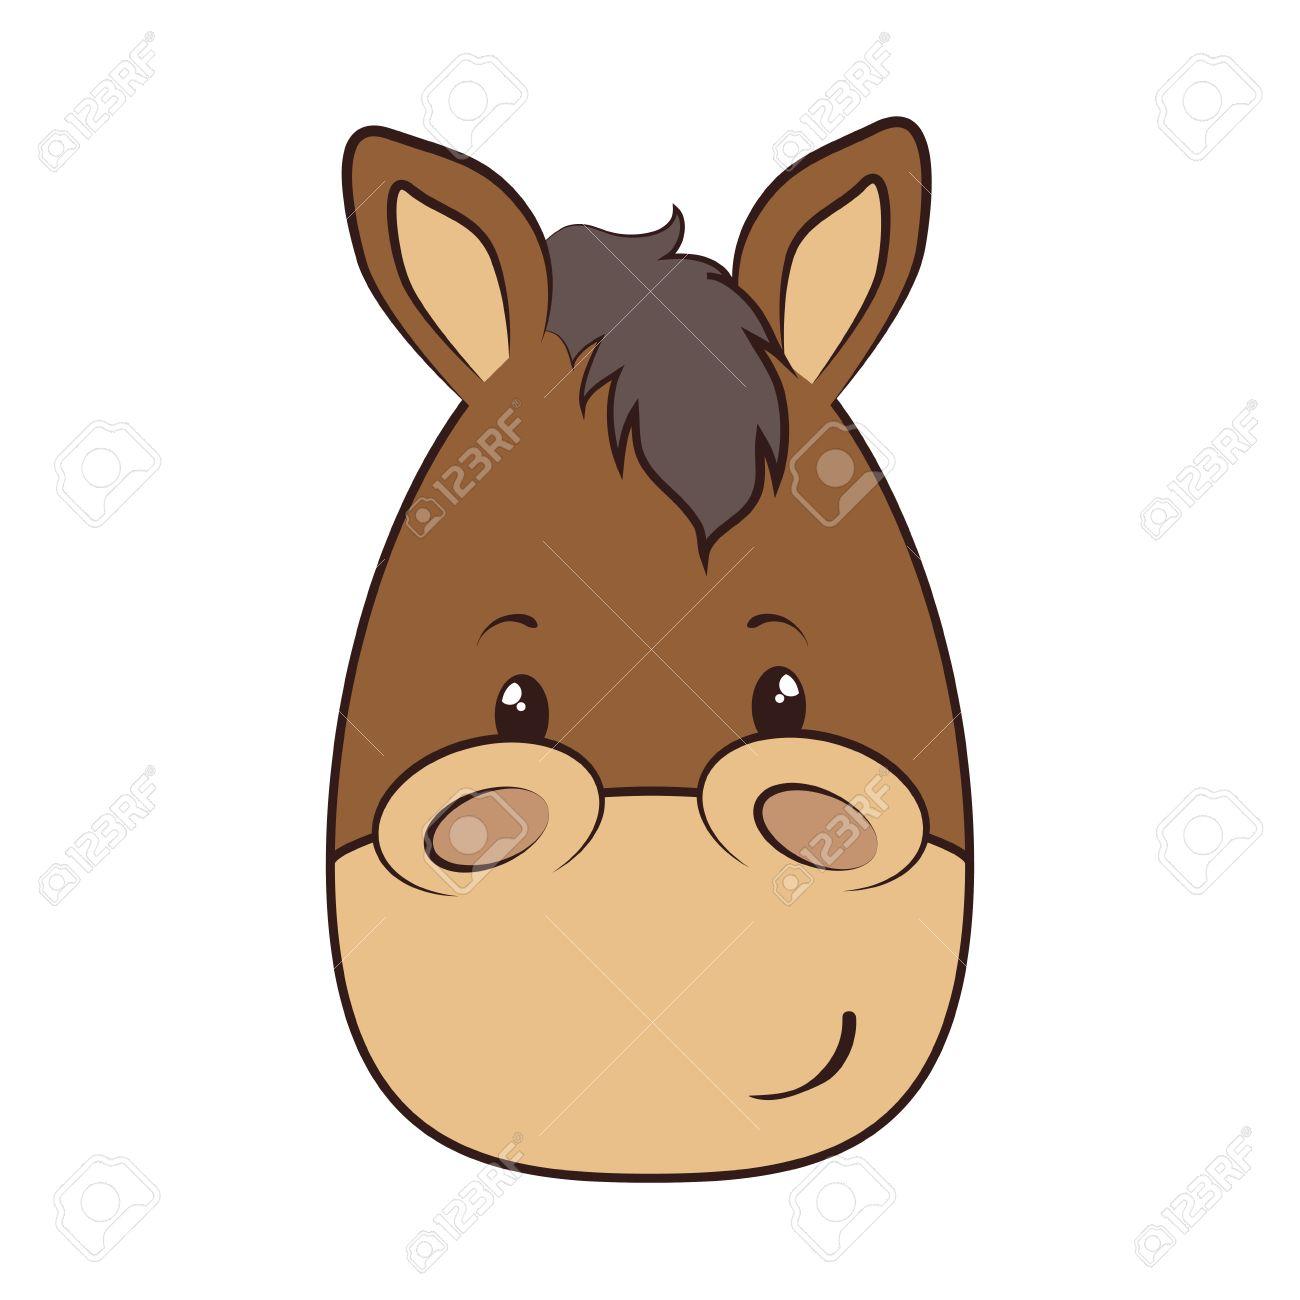 Horse Face Clipart.